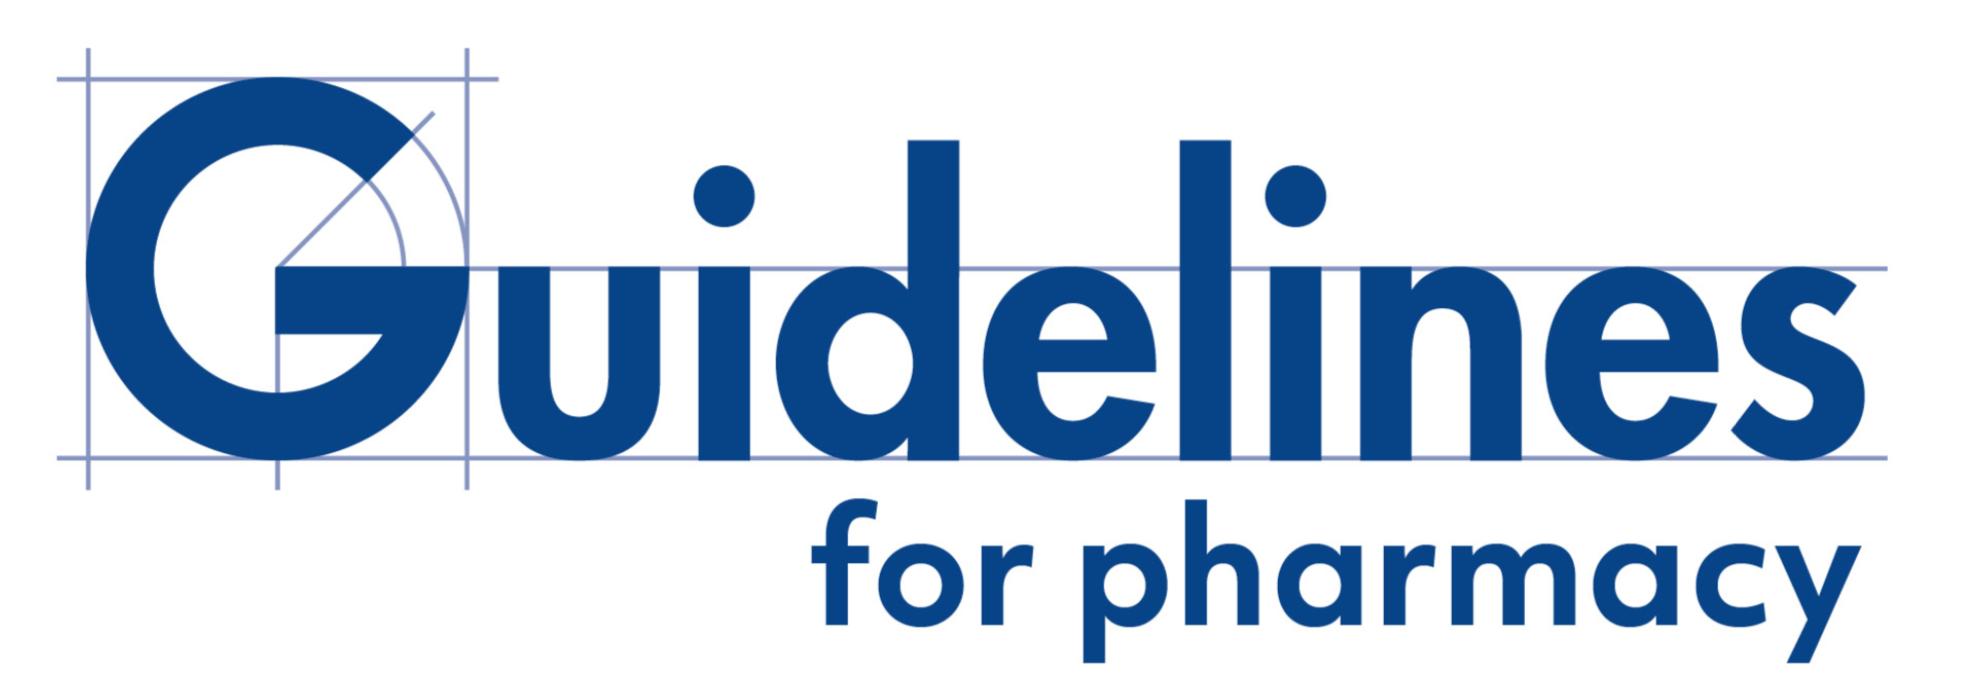 Guidelines For Pharmacy